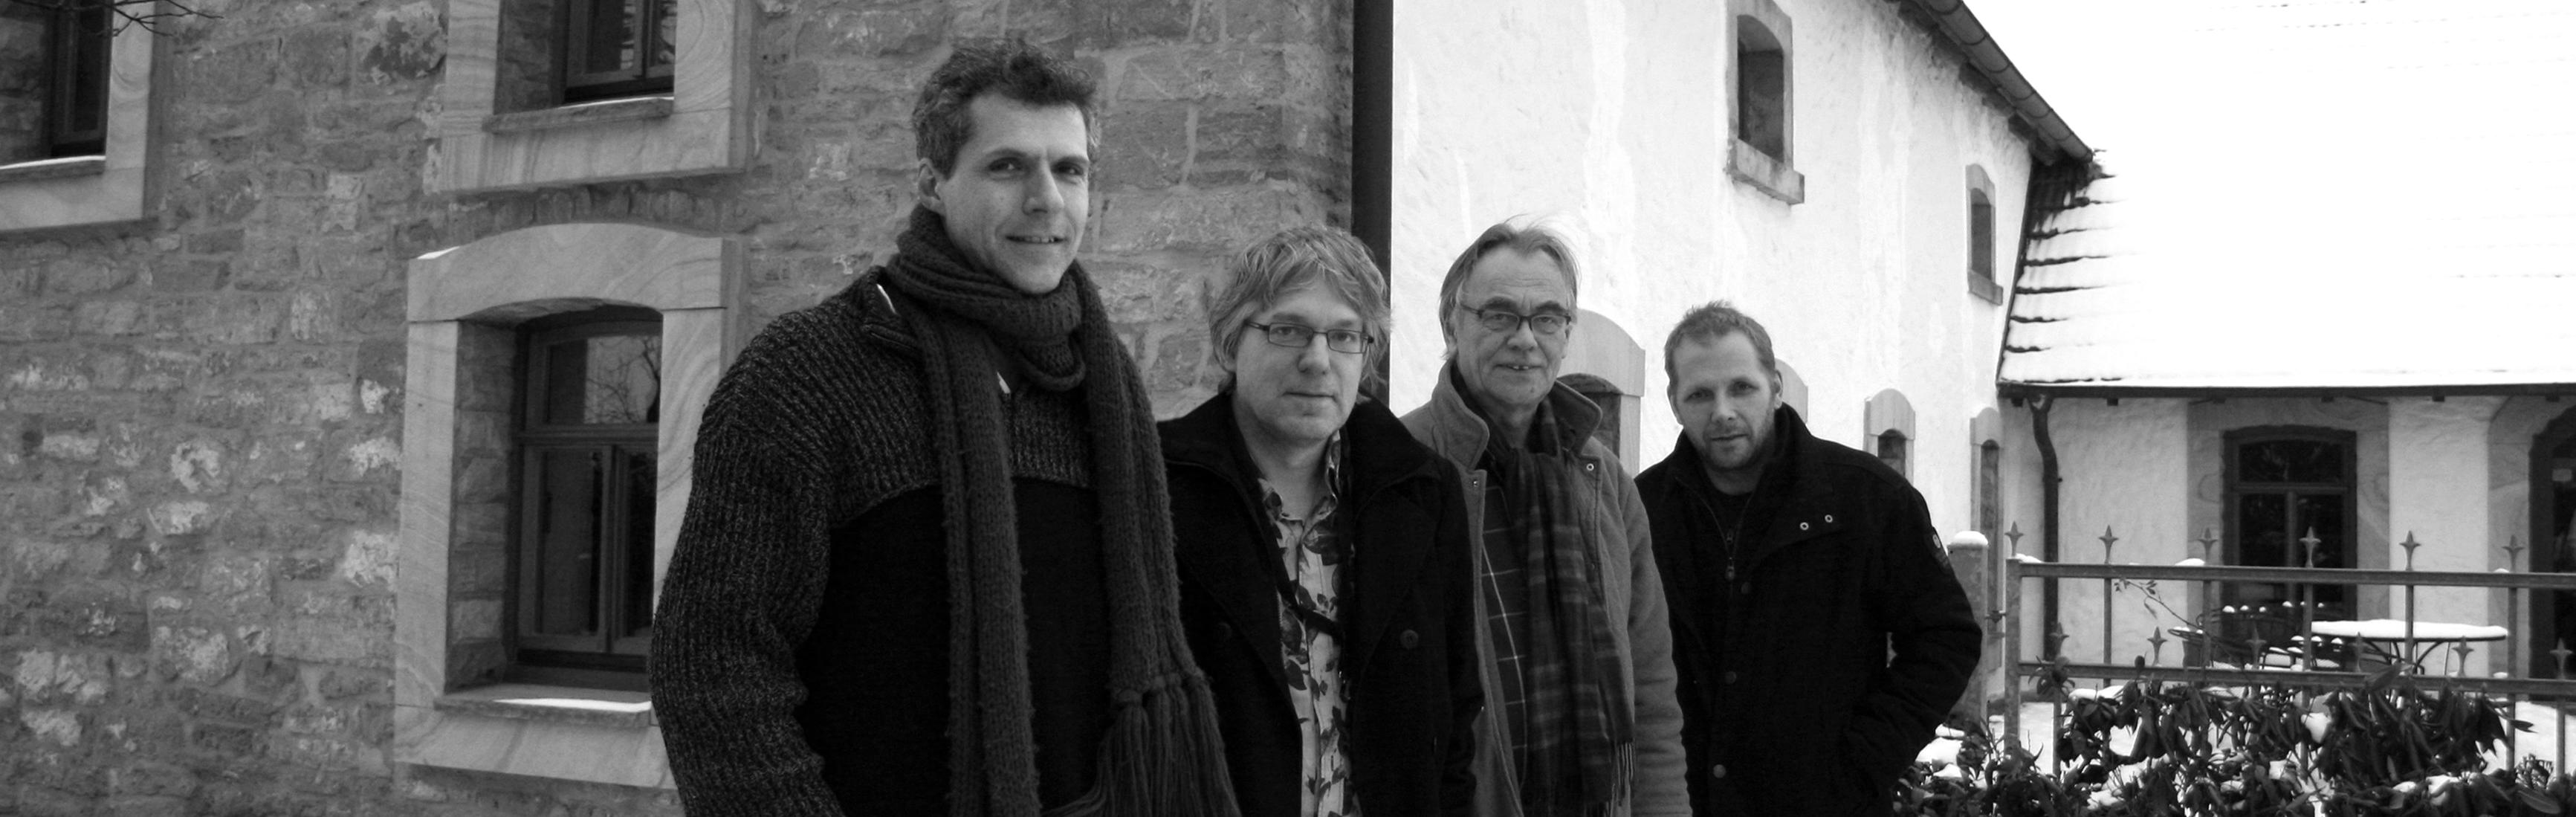 Gerlo Hesselink Quartet